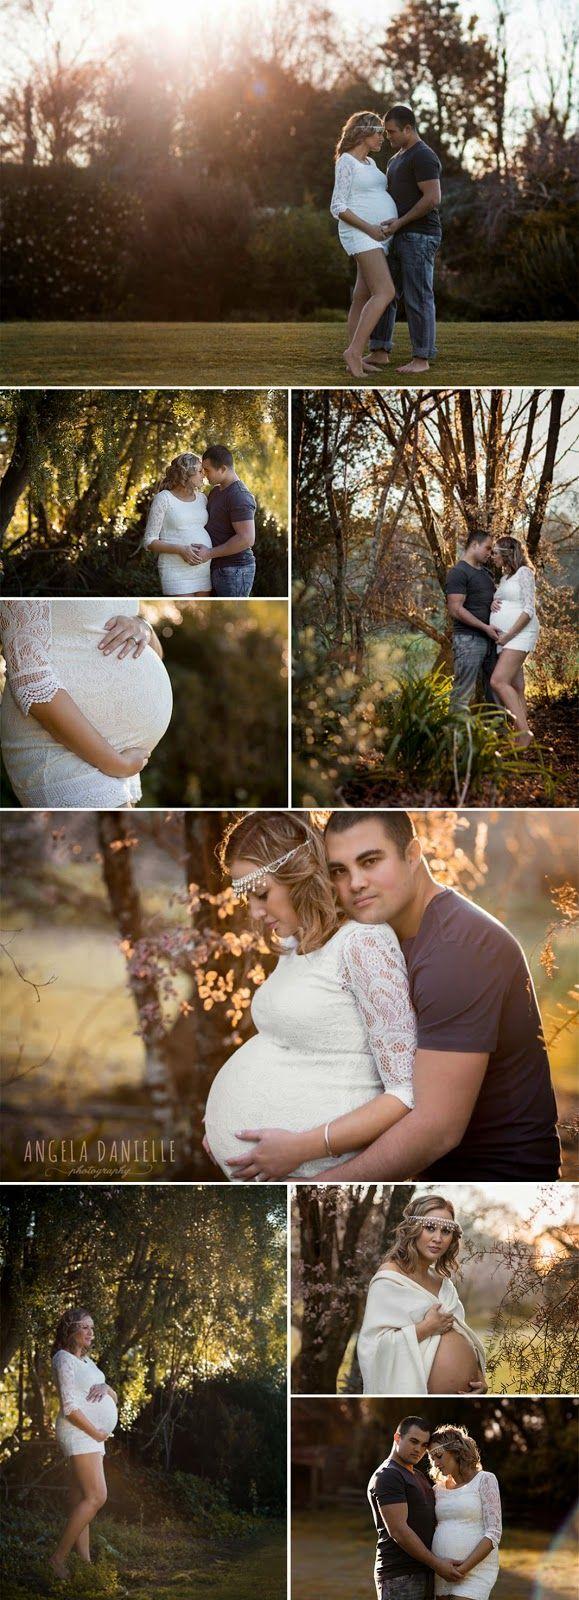 Gorgeous maternity session www.angeladaniellephotography.com.au